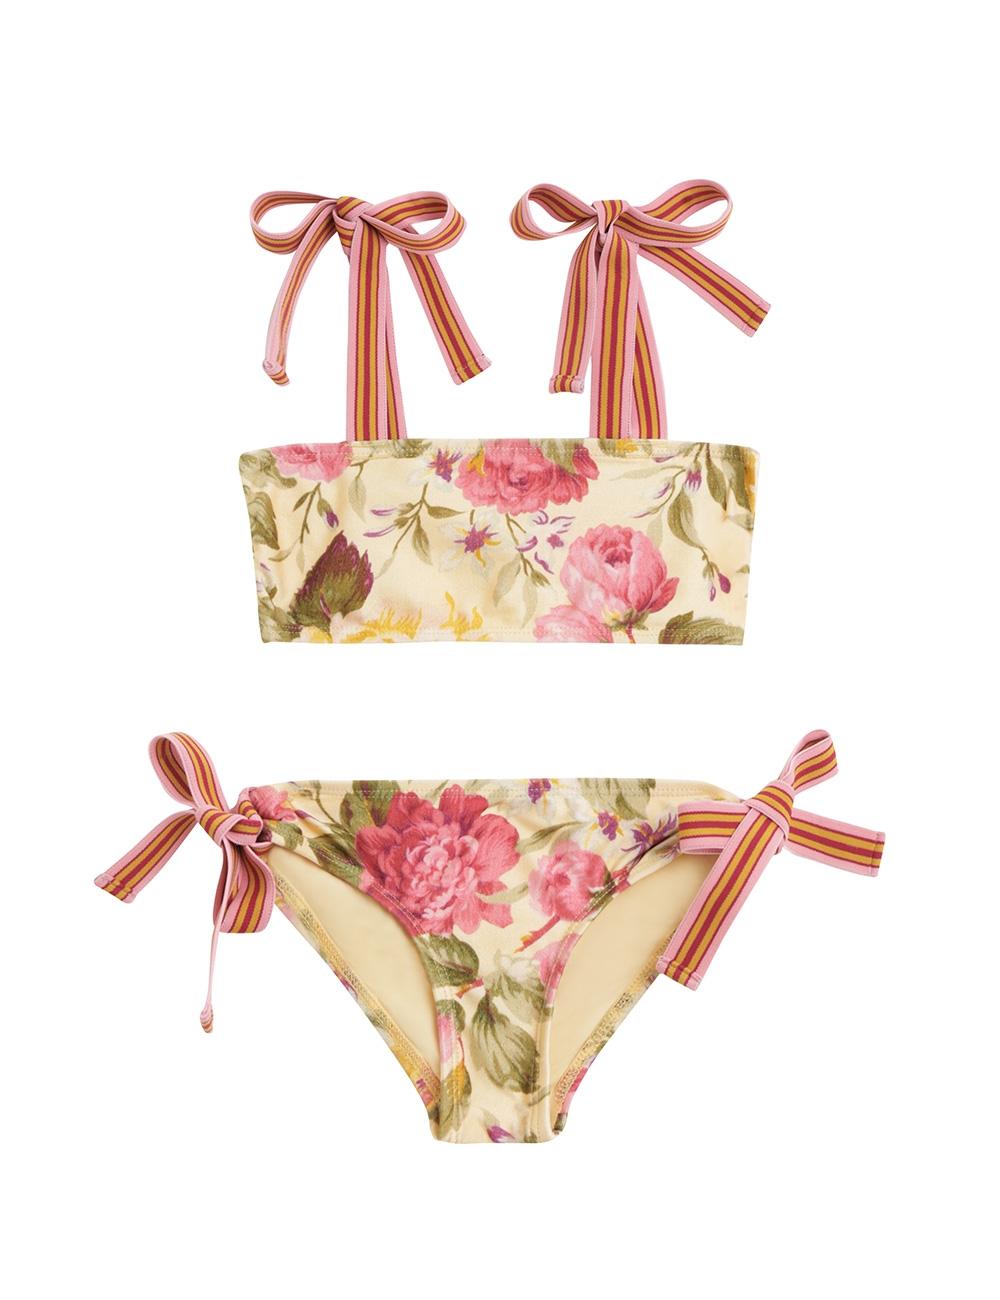 Honour Tie Bandeau Bikini